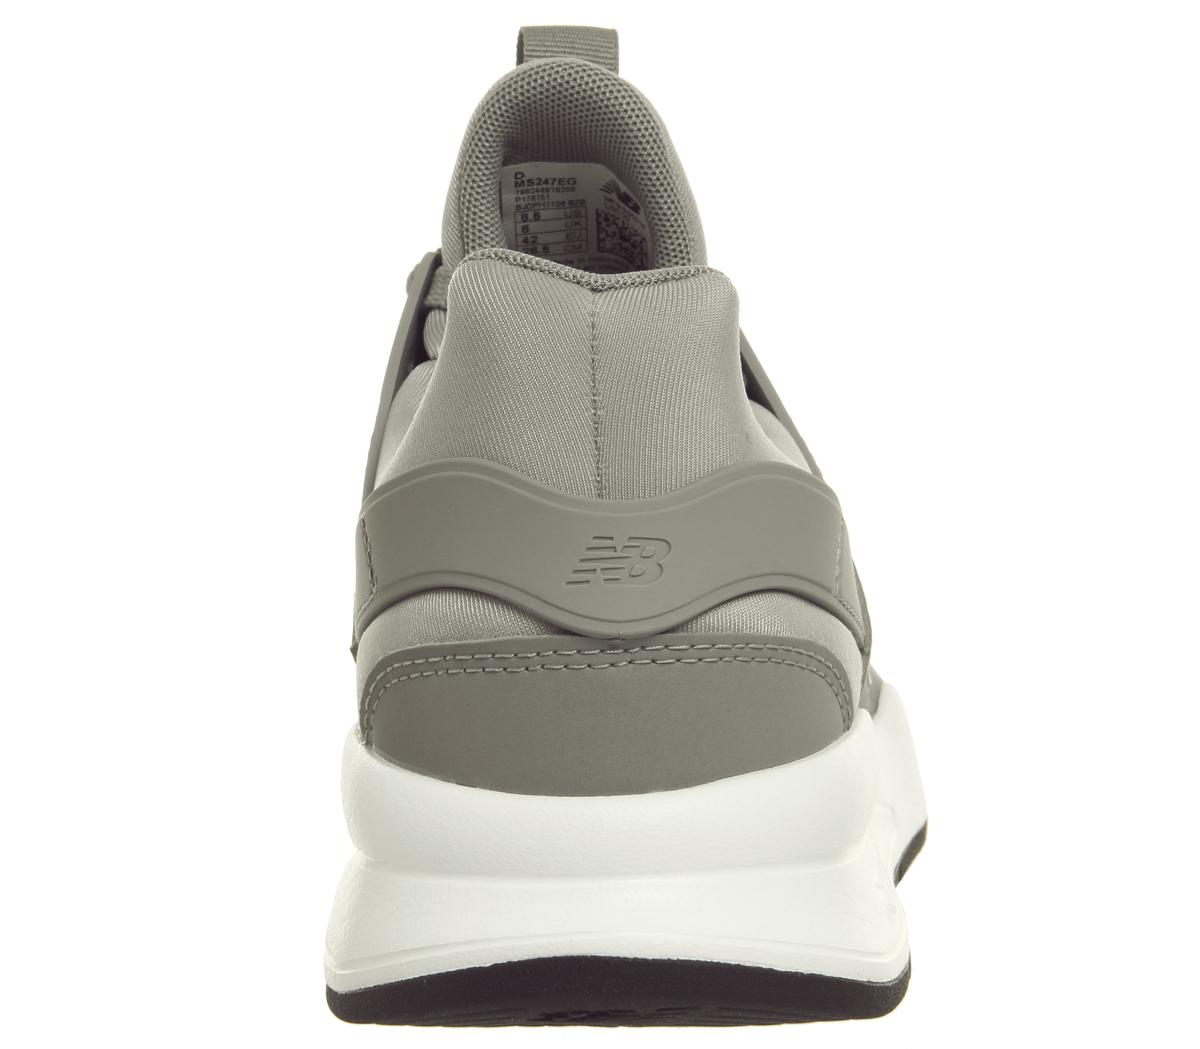 New-Balance-247V2-Baskets-Marblehead-Baskets-Chaussures miniature 7